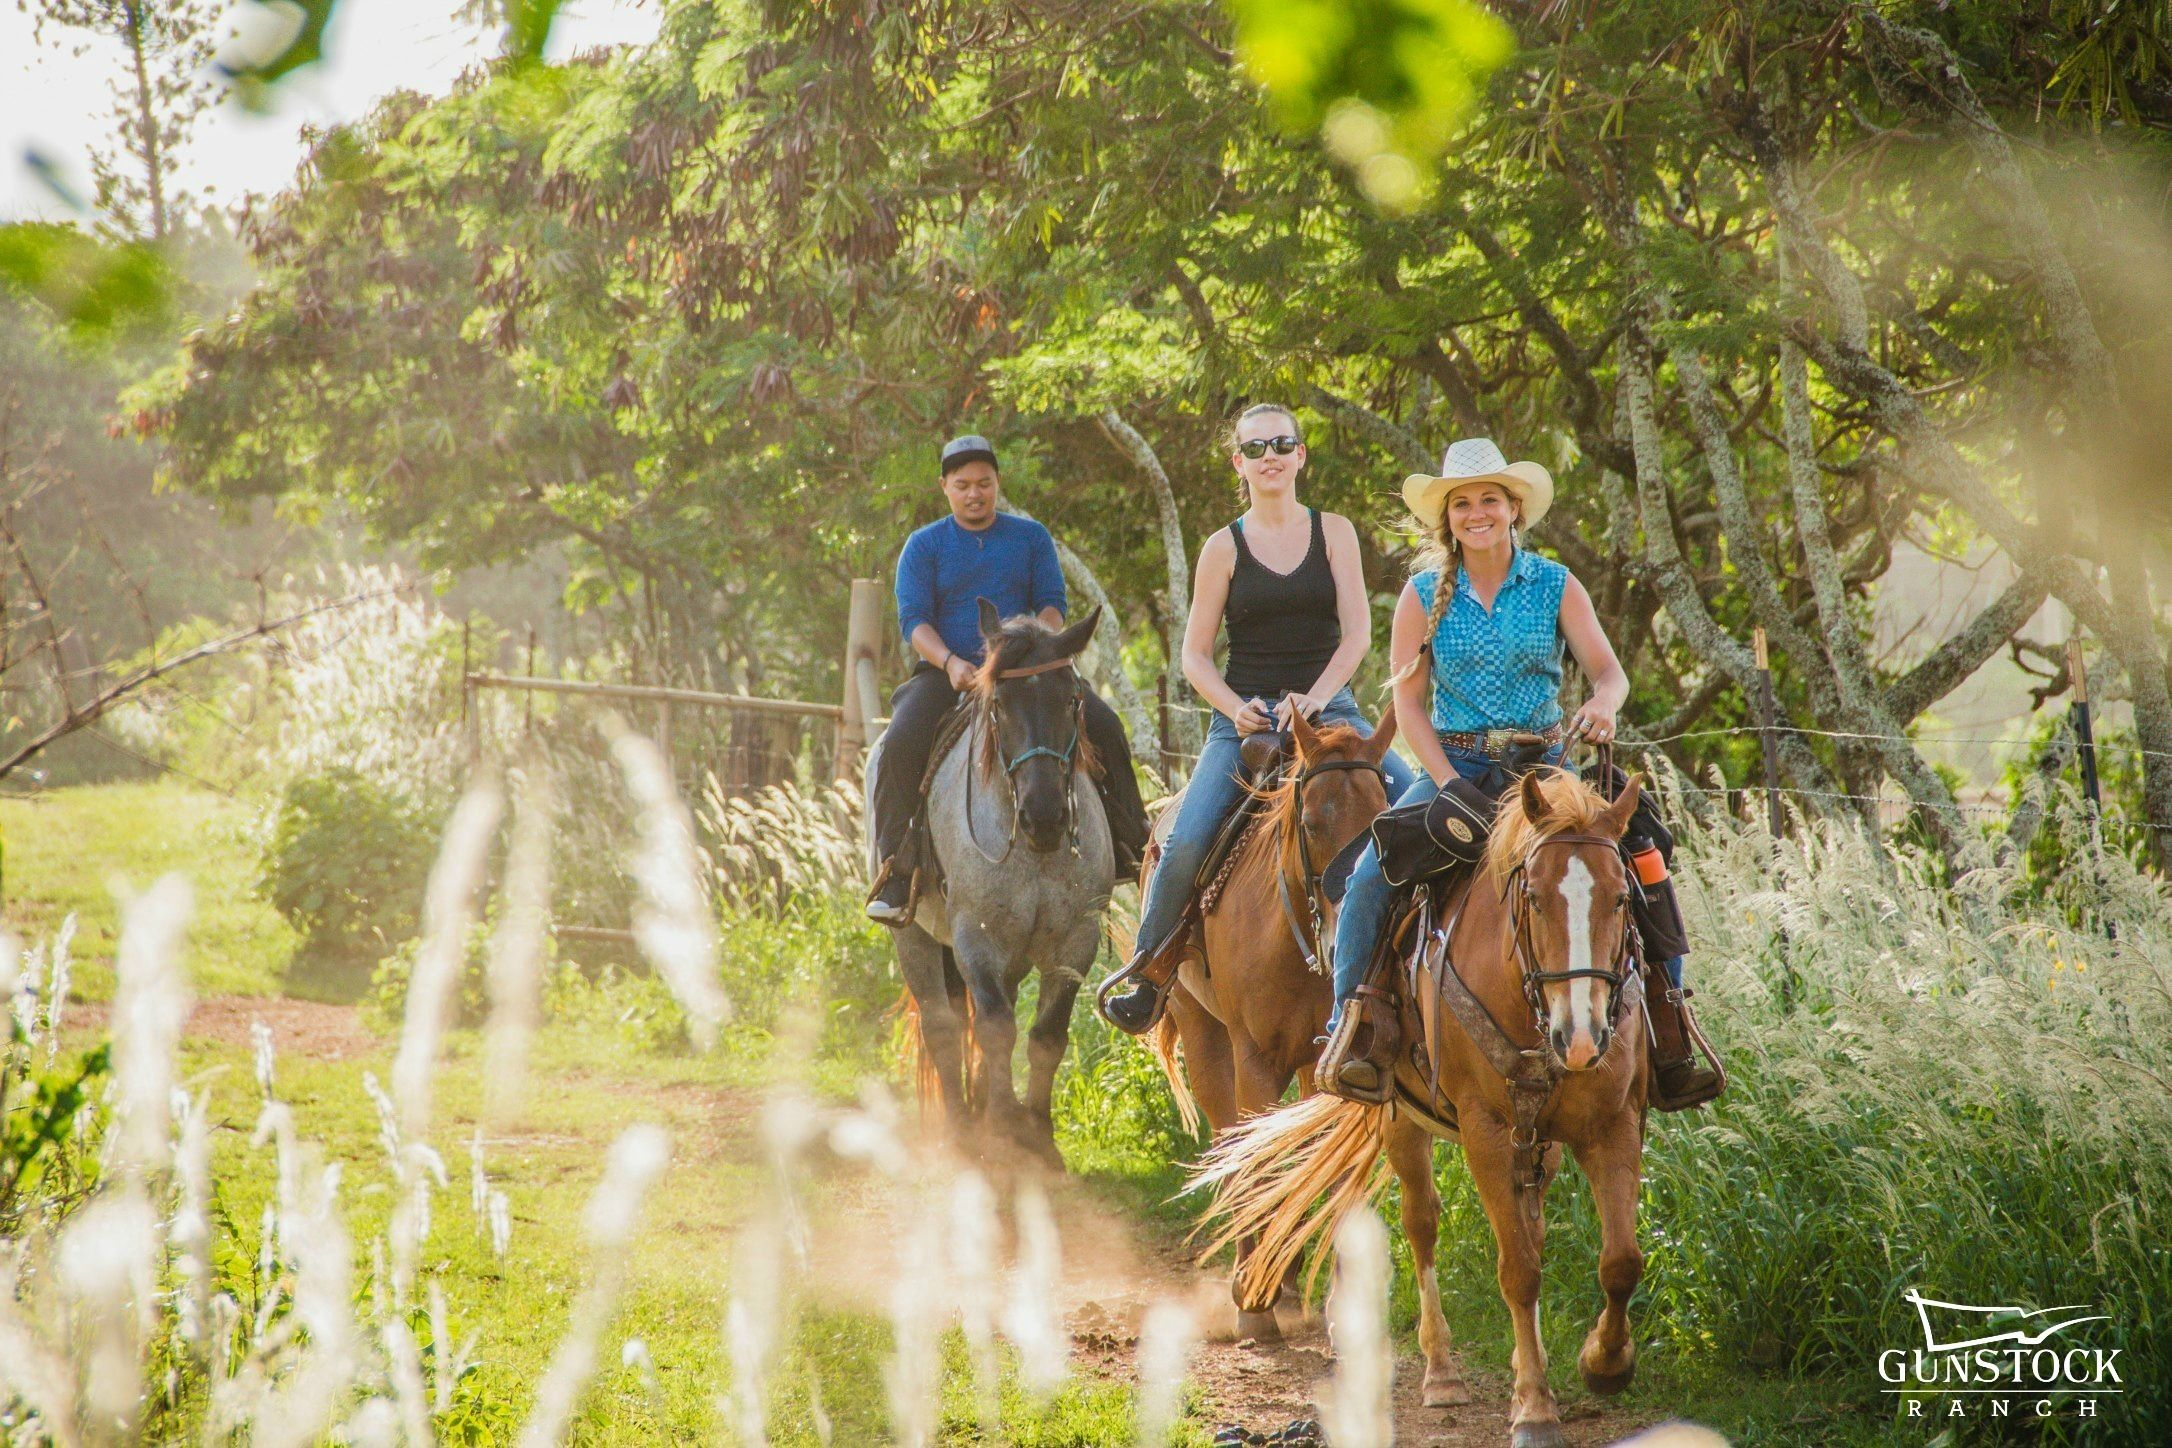 Group of horseback riders in Hawaii